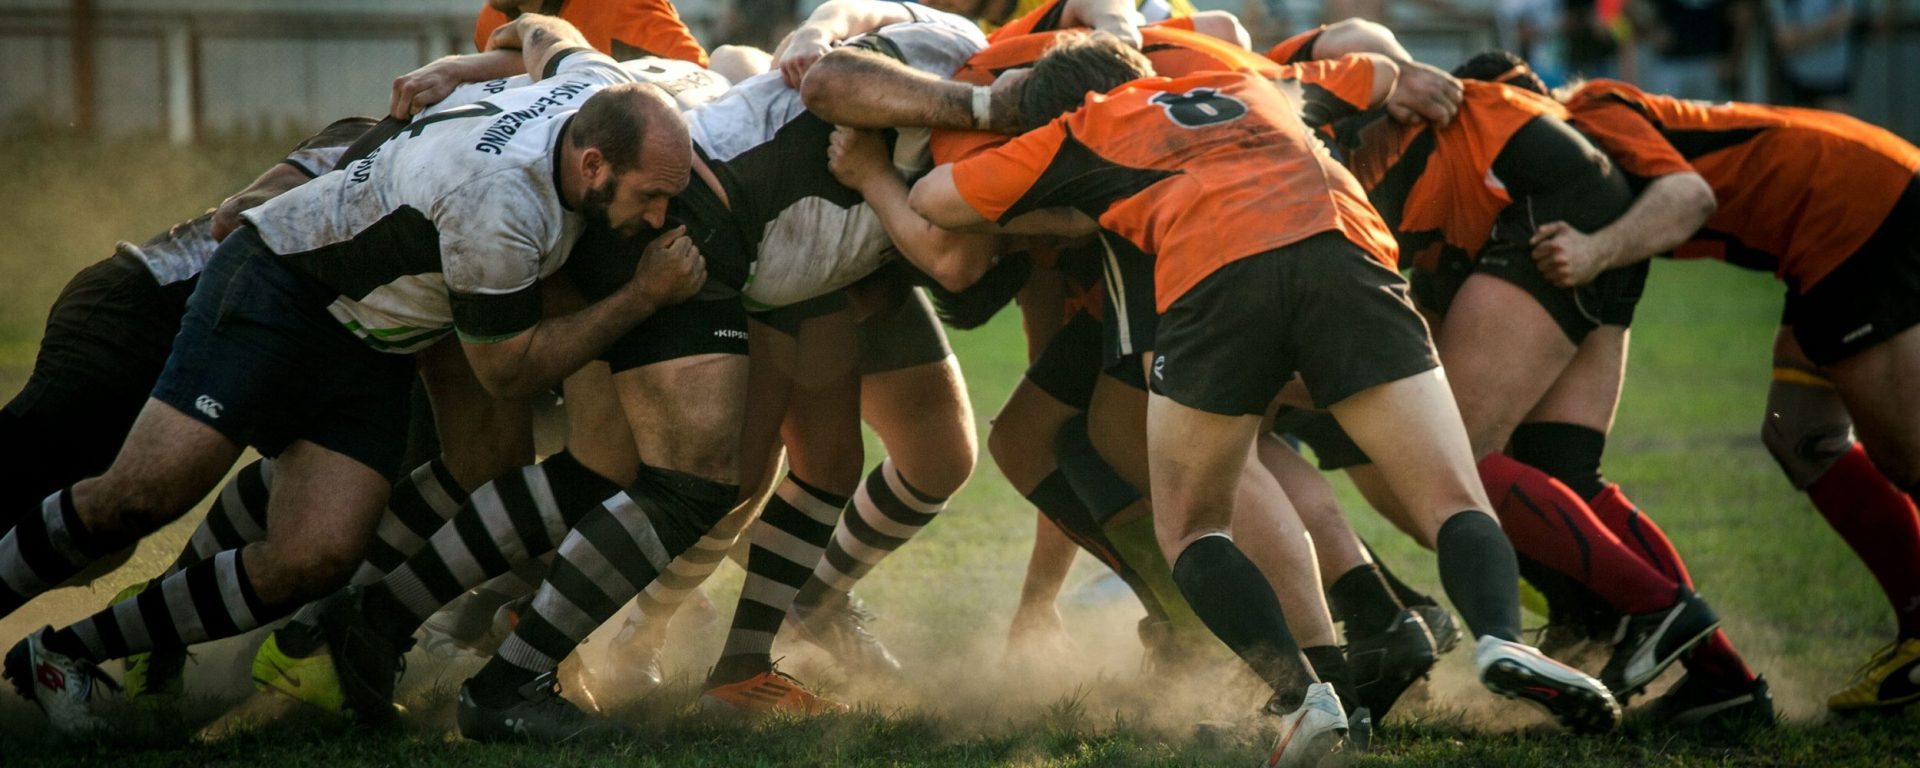 Sports players in scrum. Image: Olga Guryanova via Unsplash